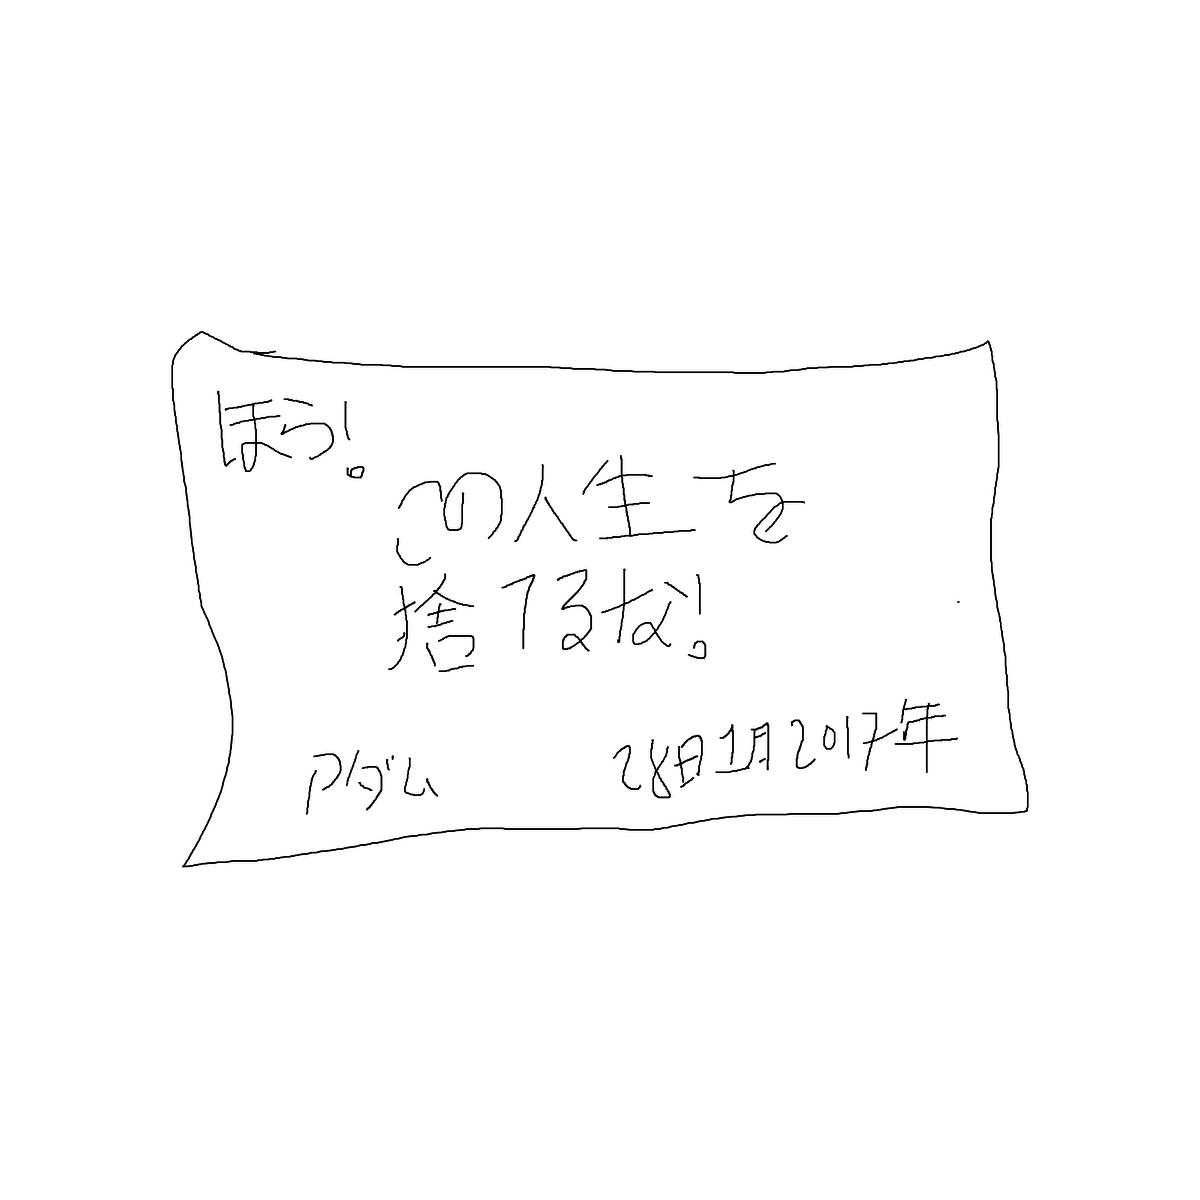 BAAAM drawing#22690 lat:52.4787025451660160lng: 13.4079151153564450